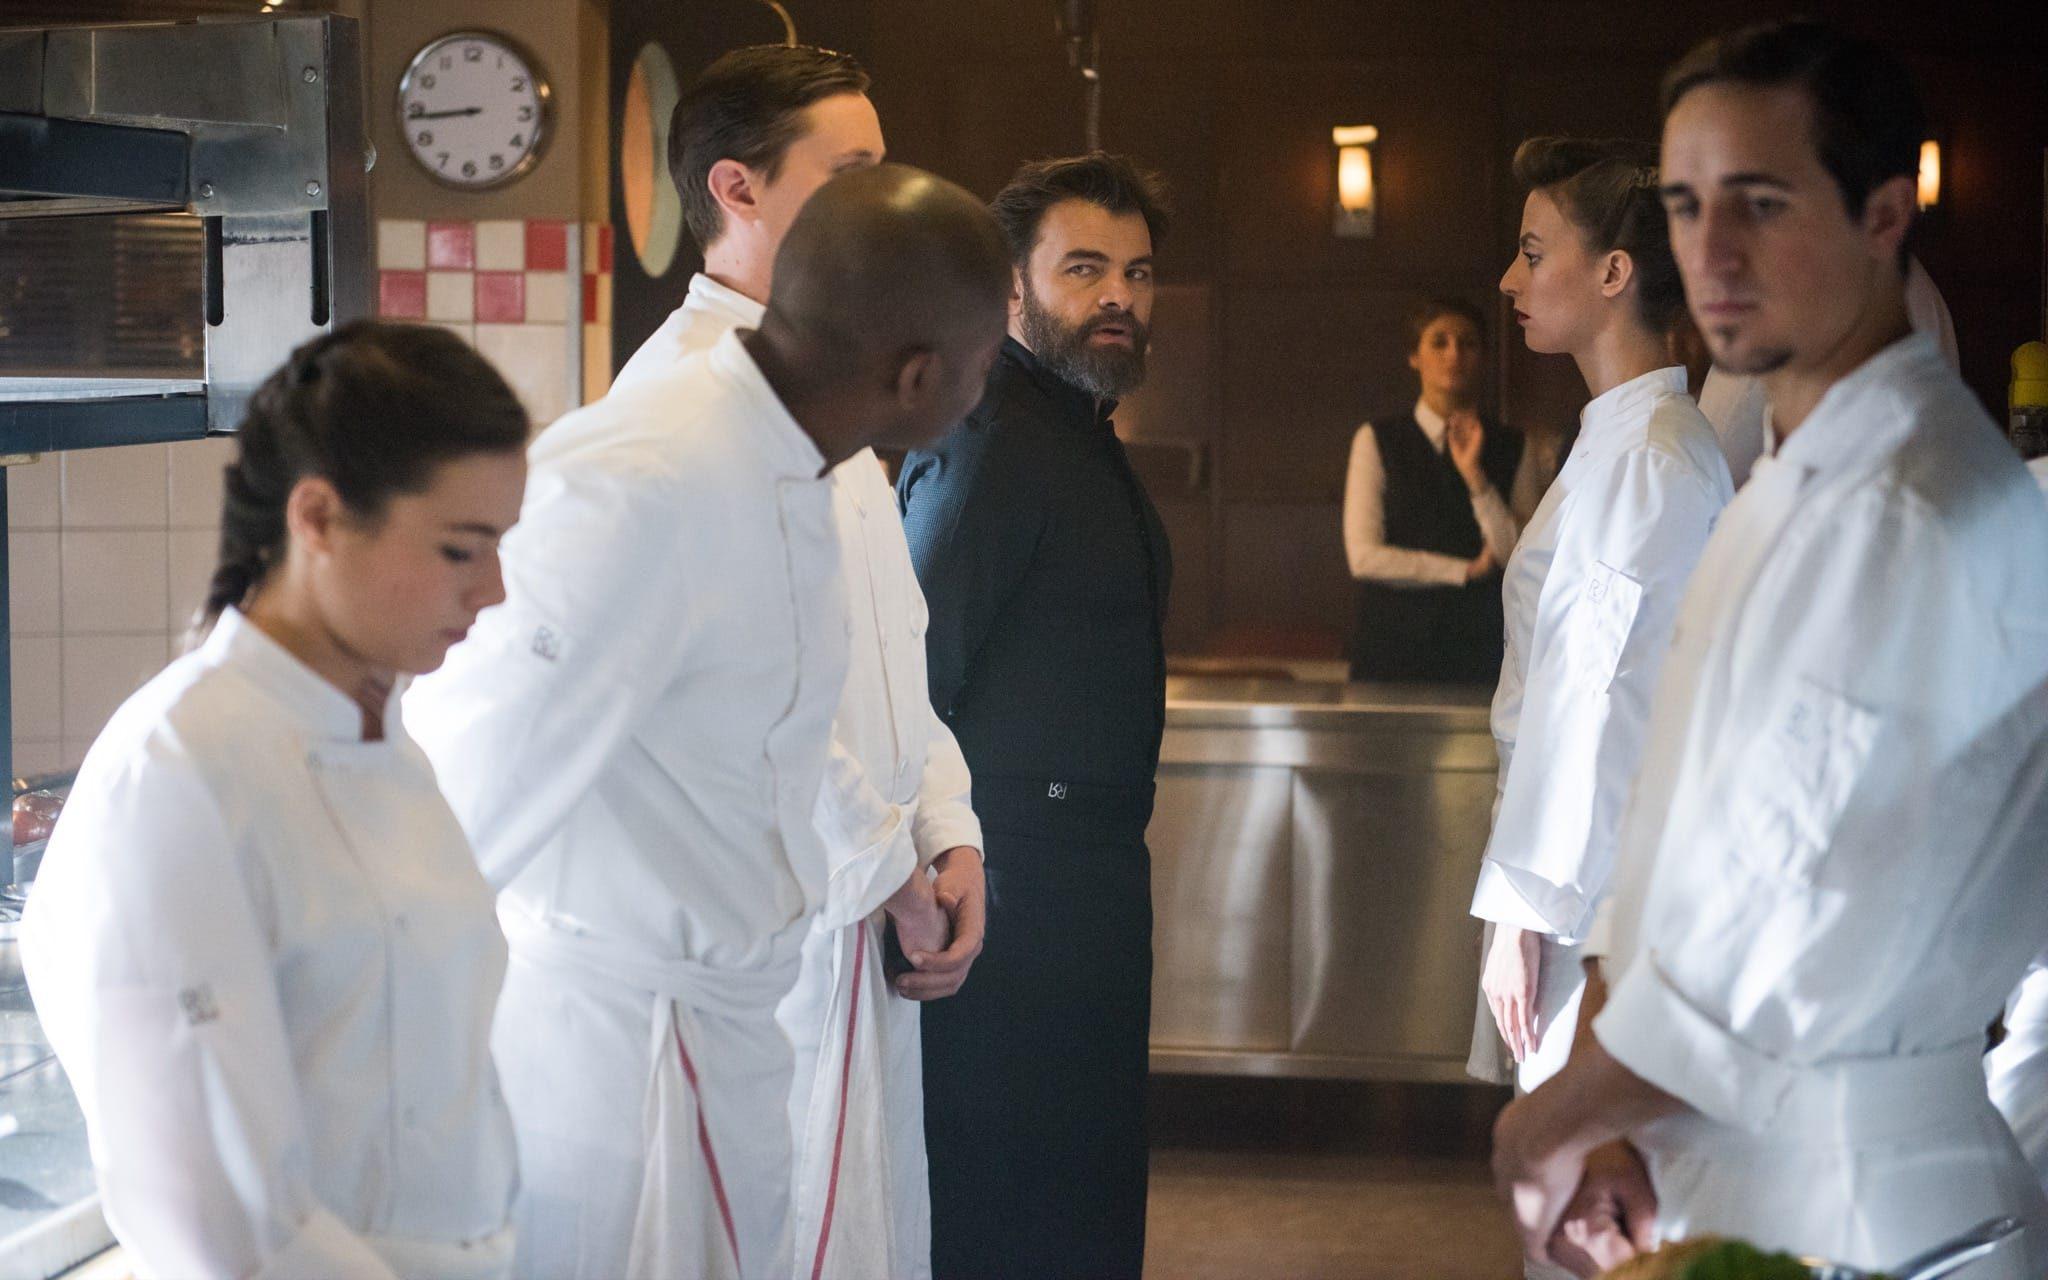 chefs-saison-2-episode-8-2